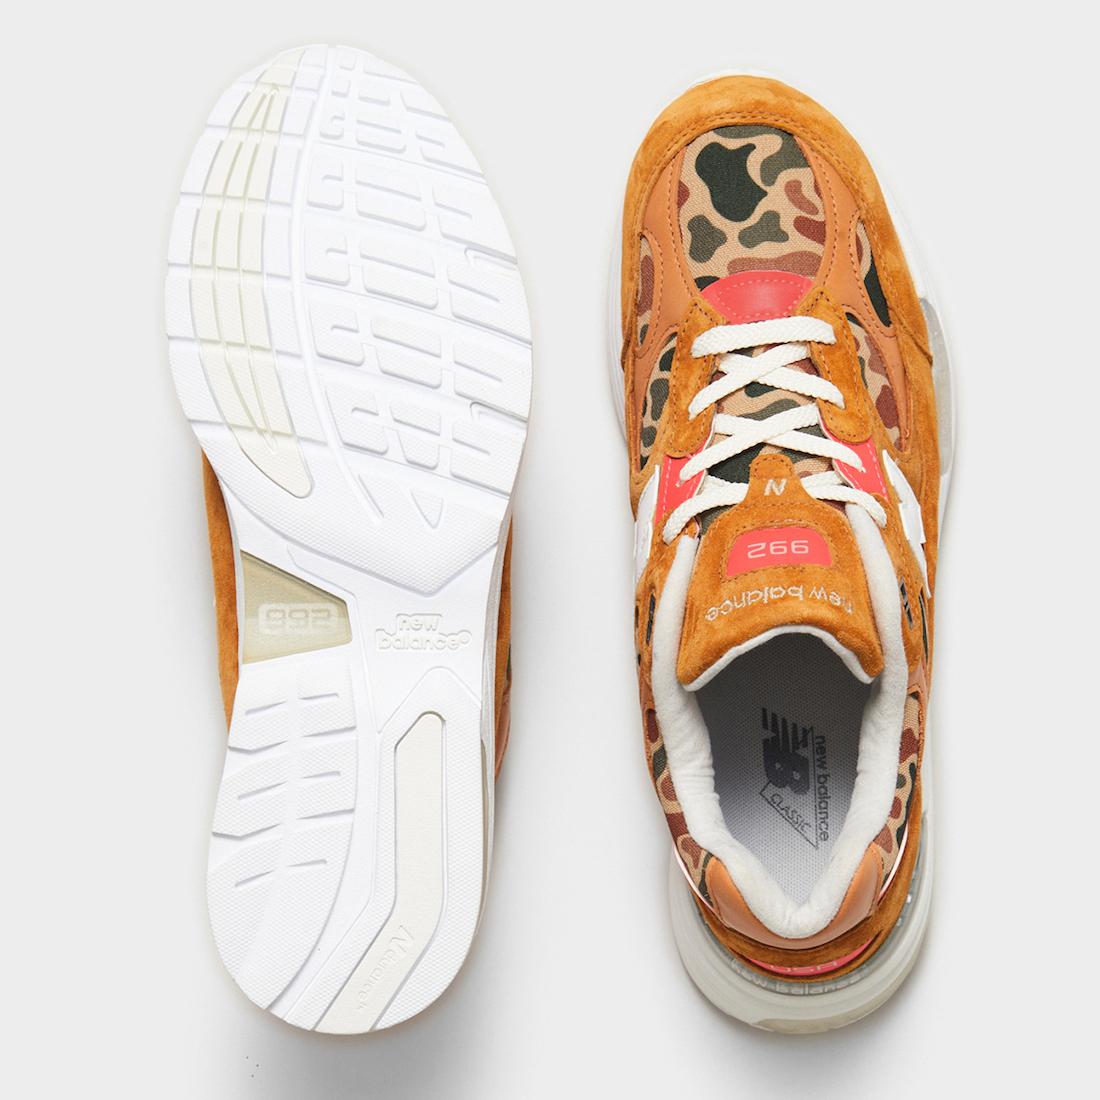 运动鞋, 跑鞋, New Balance 992, New Balance, ABZORB